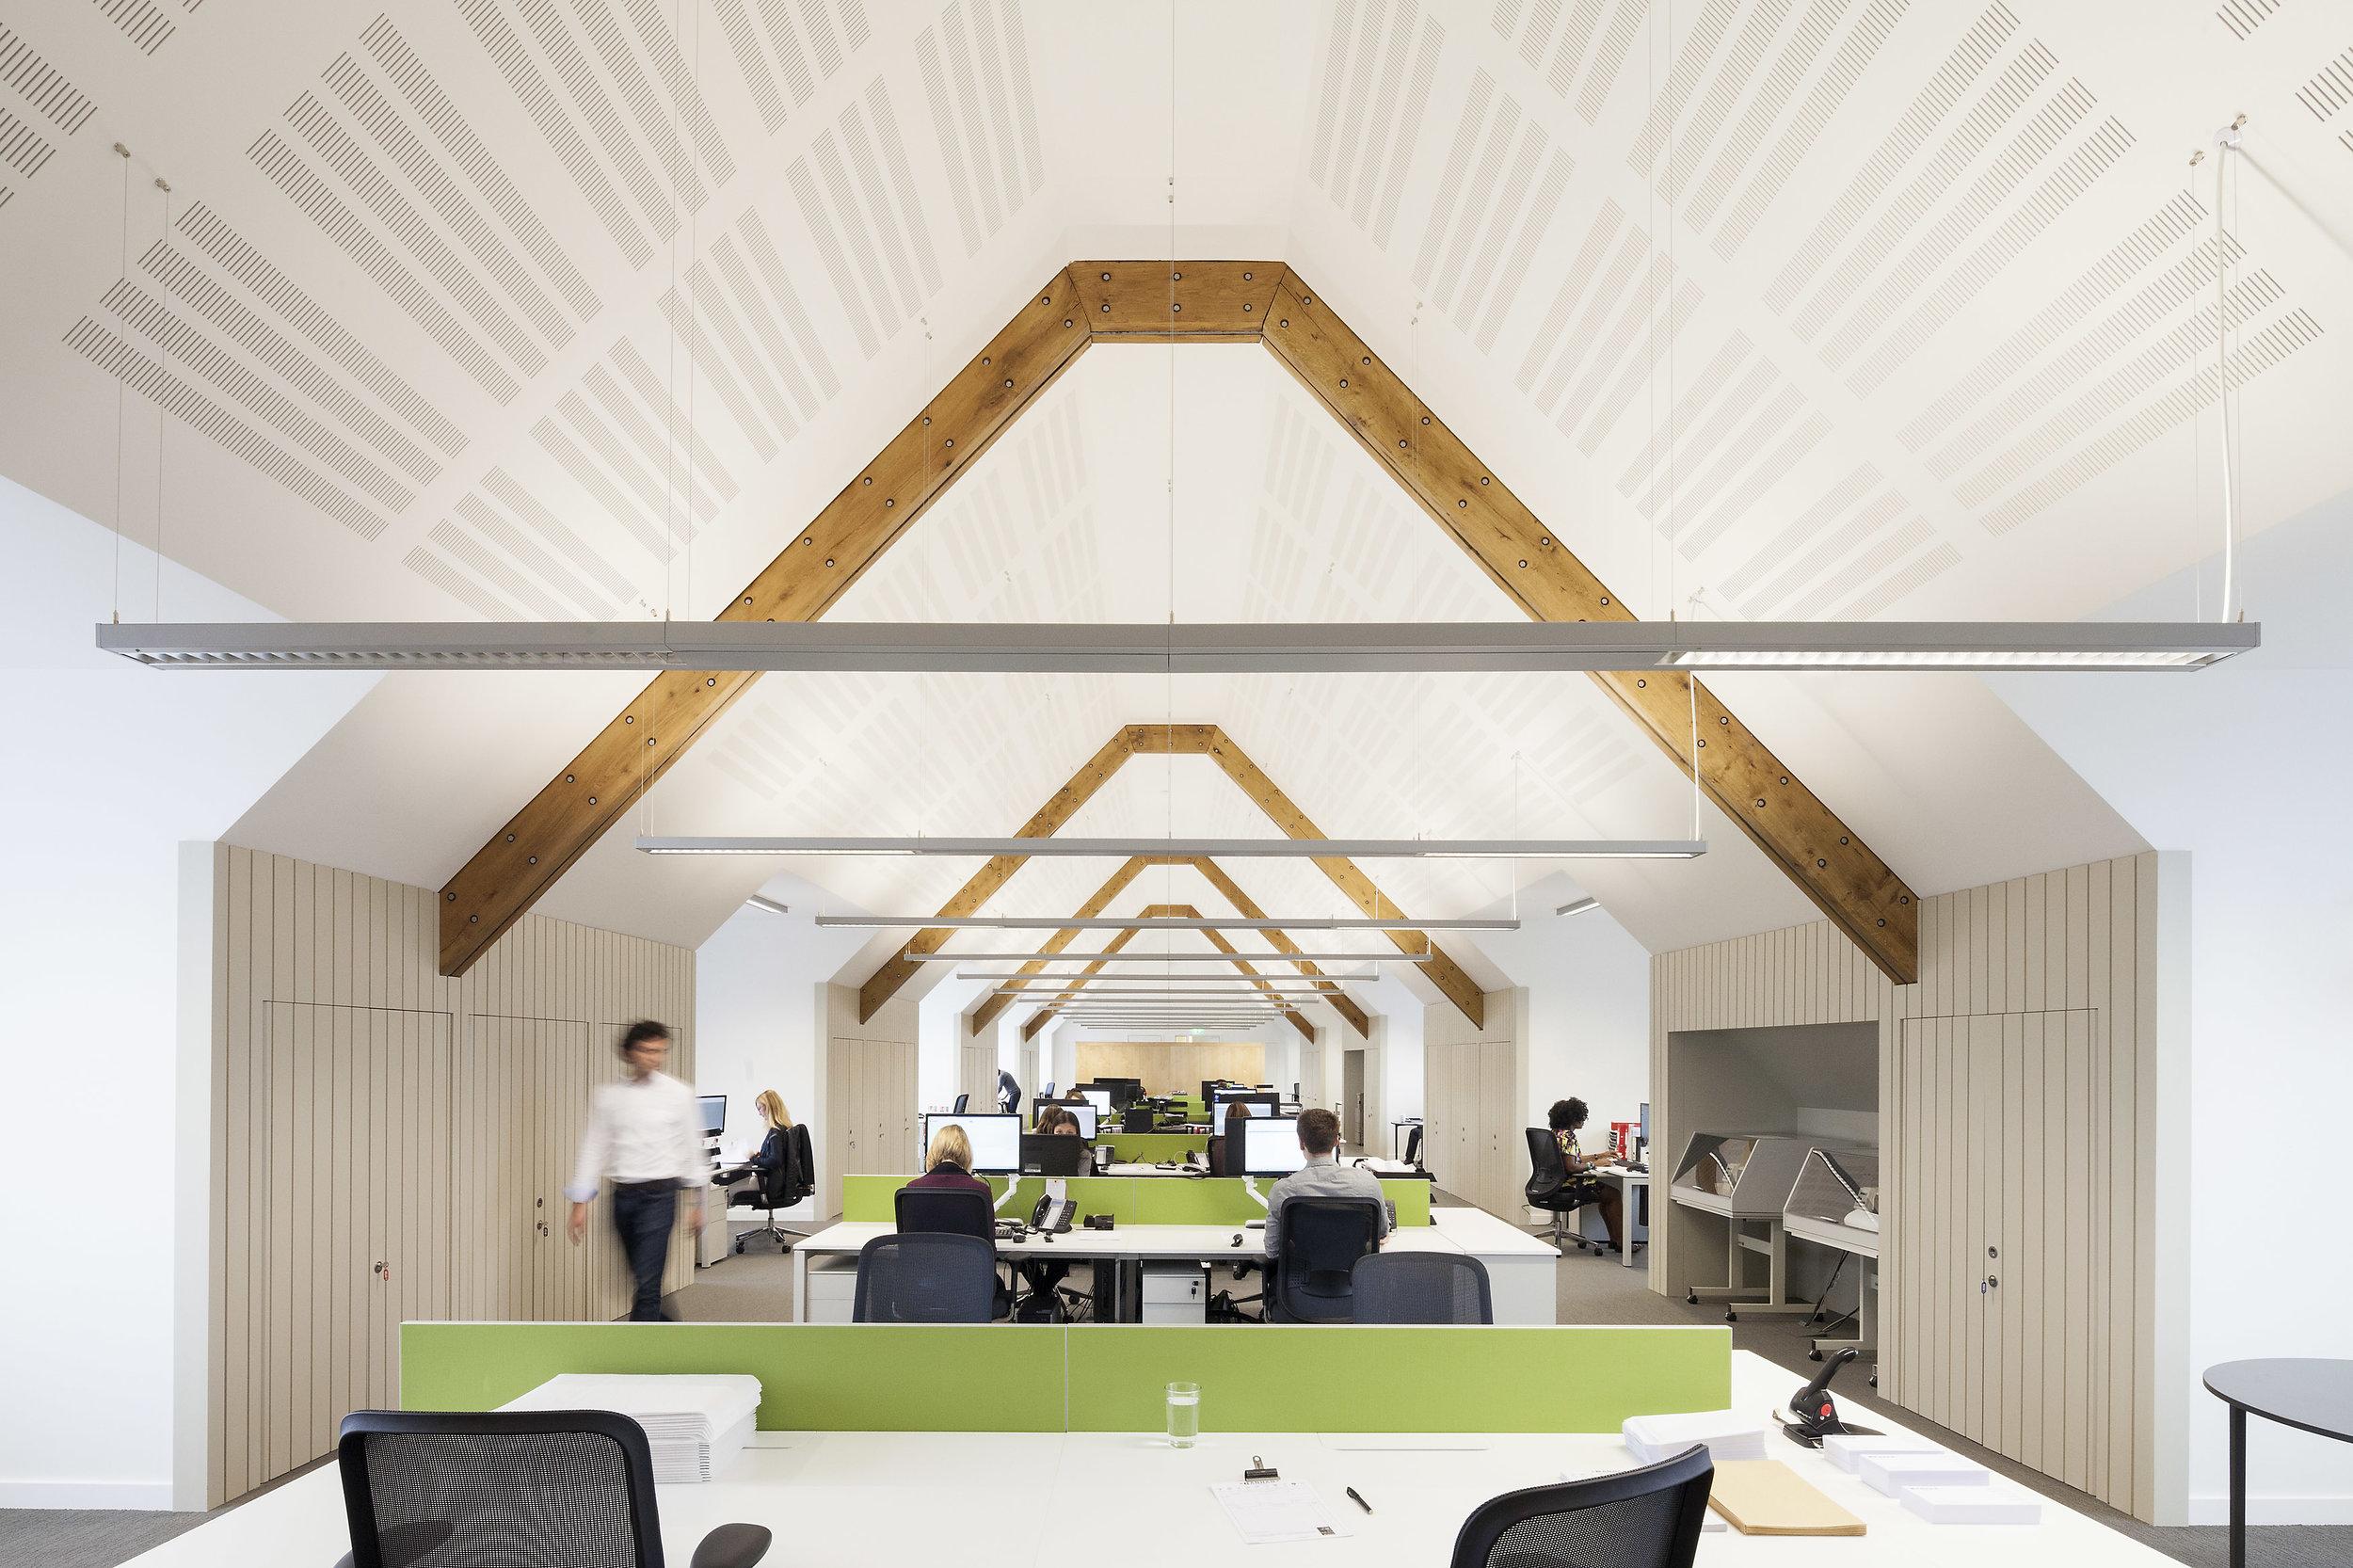 banham security - Wandsworth headquarters, London